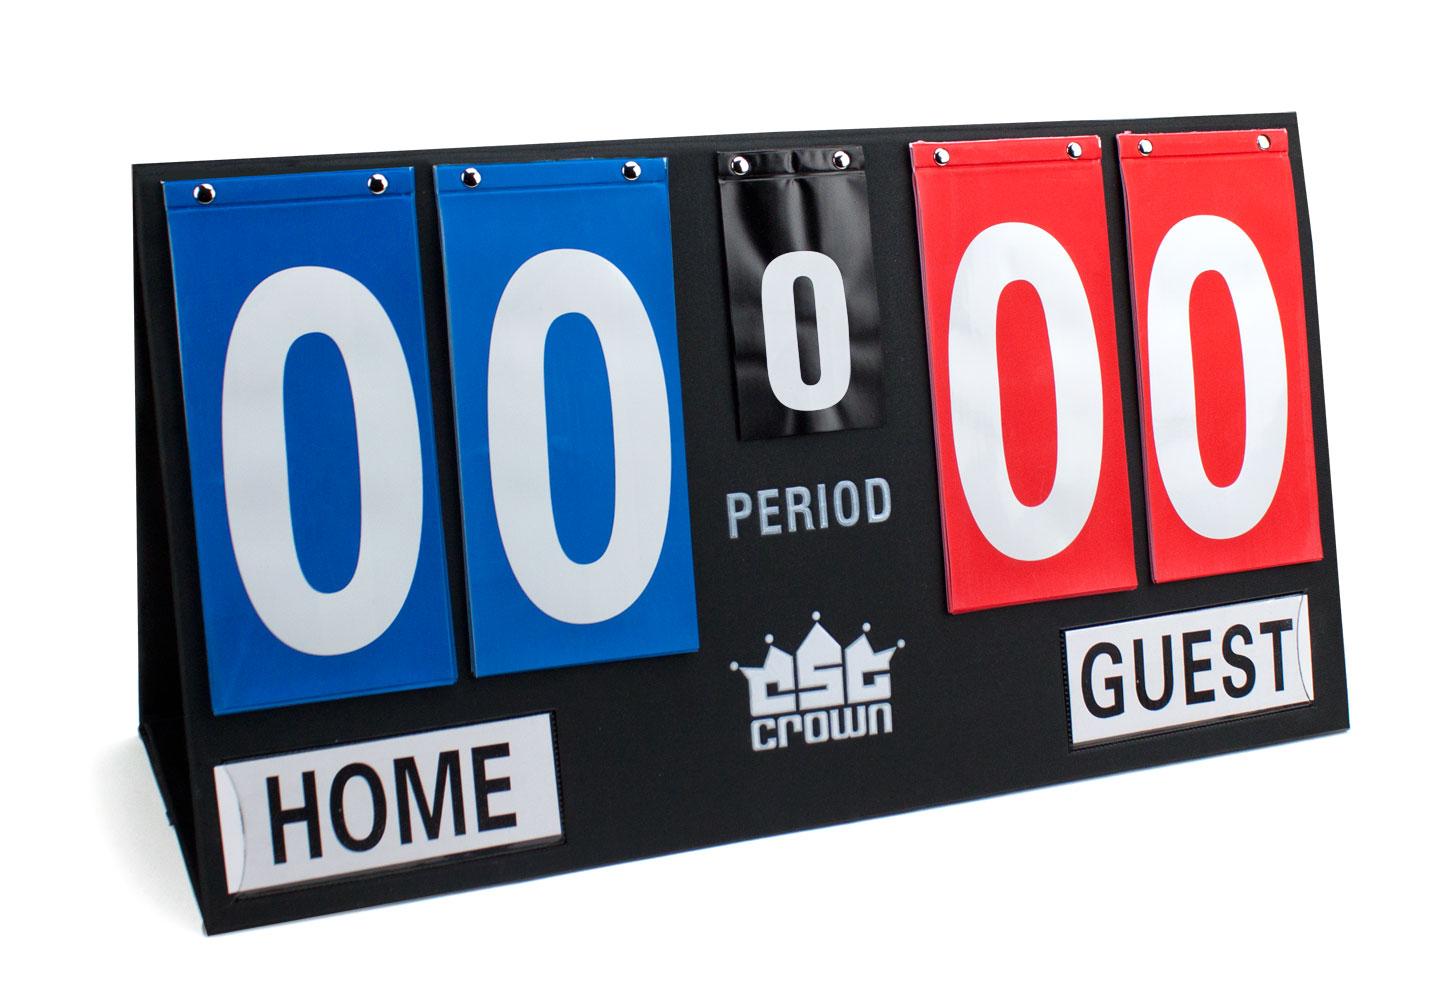 Large Deluxe Portable Scoreboard